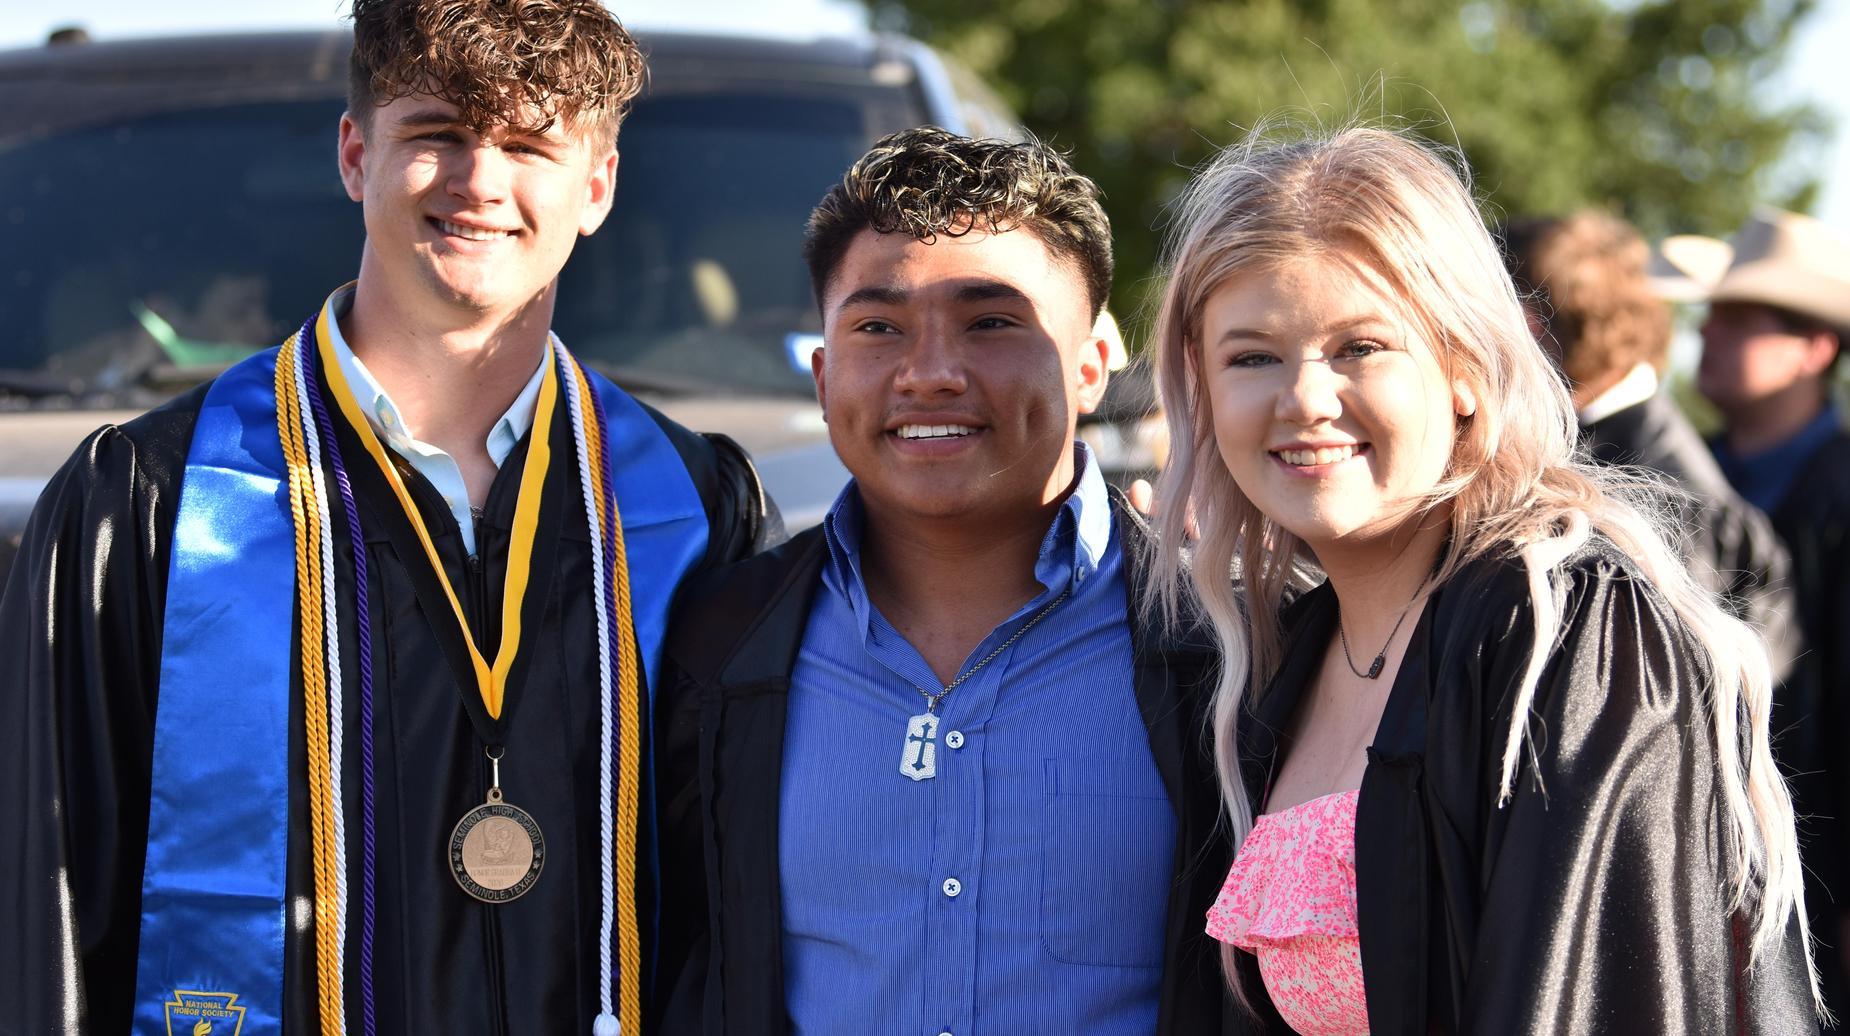 three graduating seniors